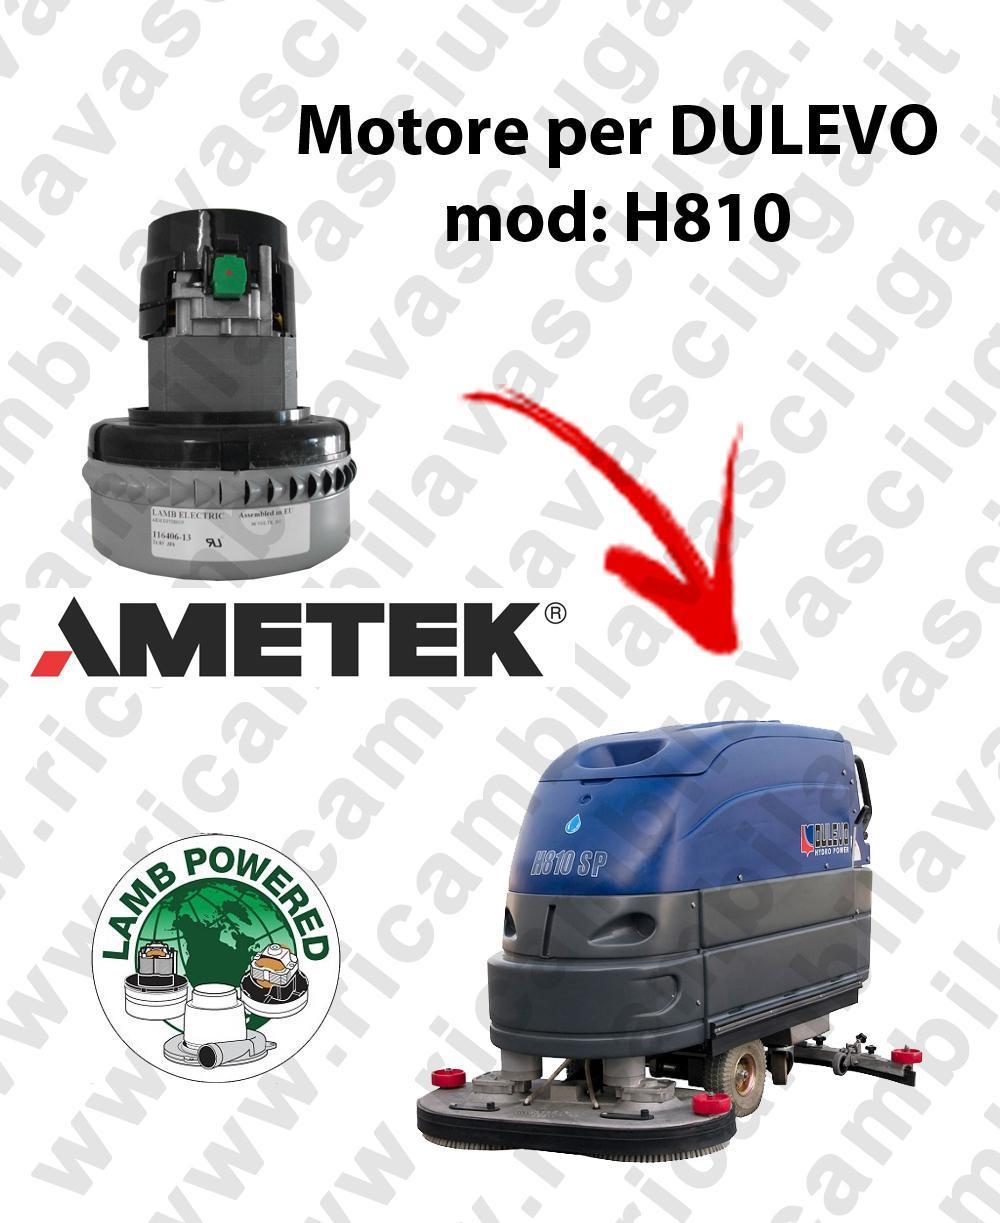 H810 Motore de aspiración LAMB AMETEK para fregadora DULEVO